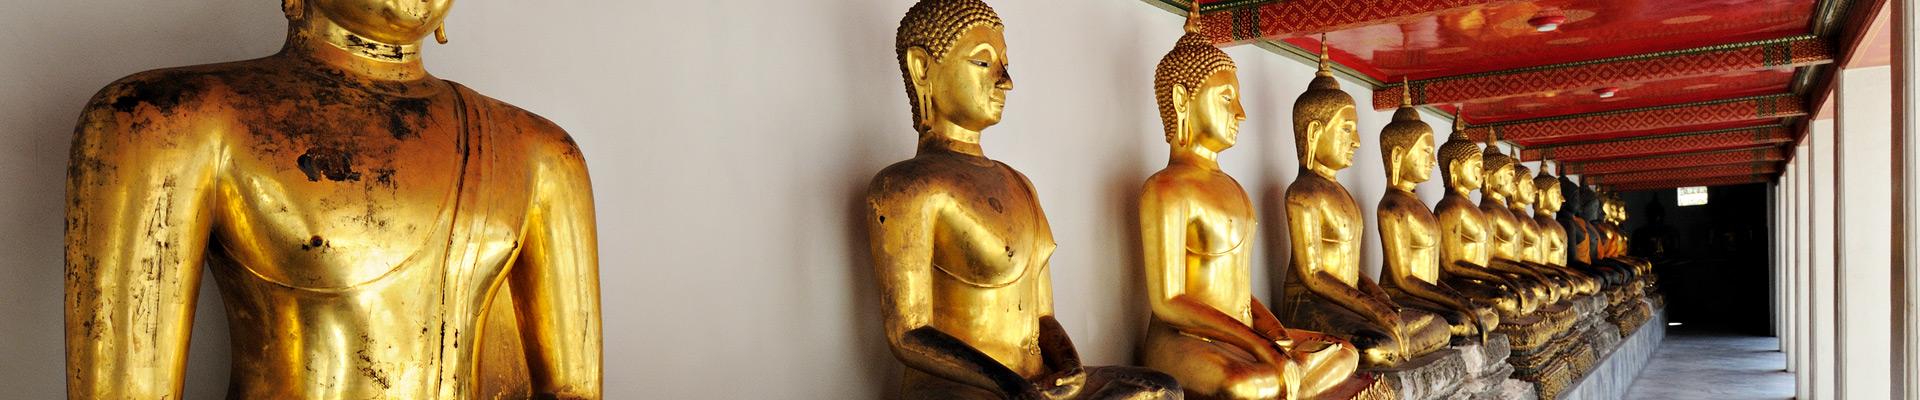 Top image bouddhas au Wat Pho de Bangkok, Thaïlande